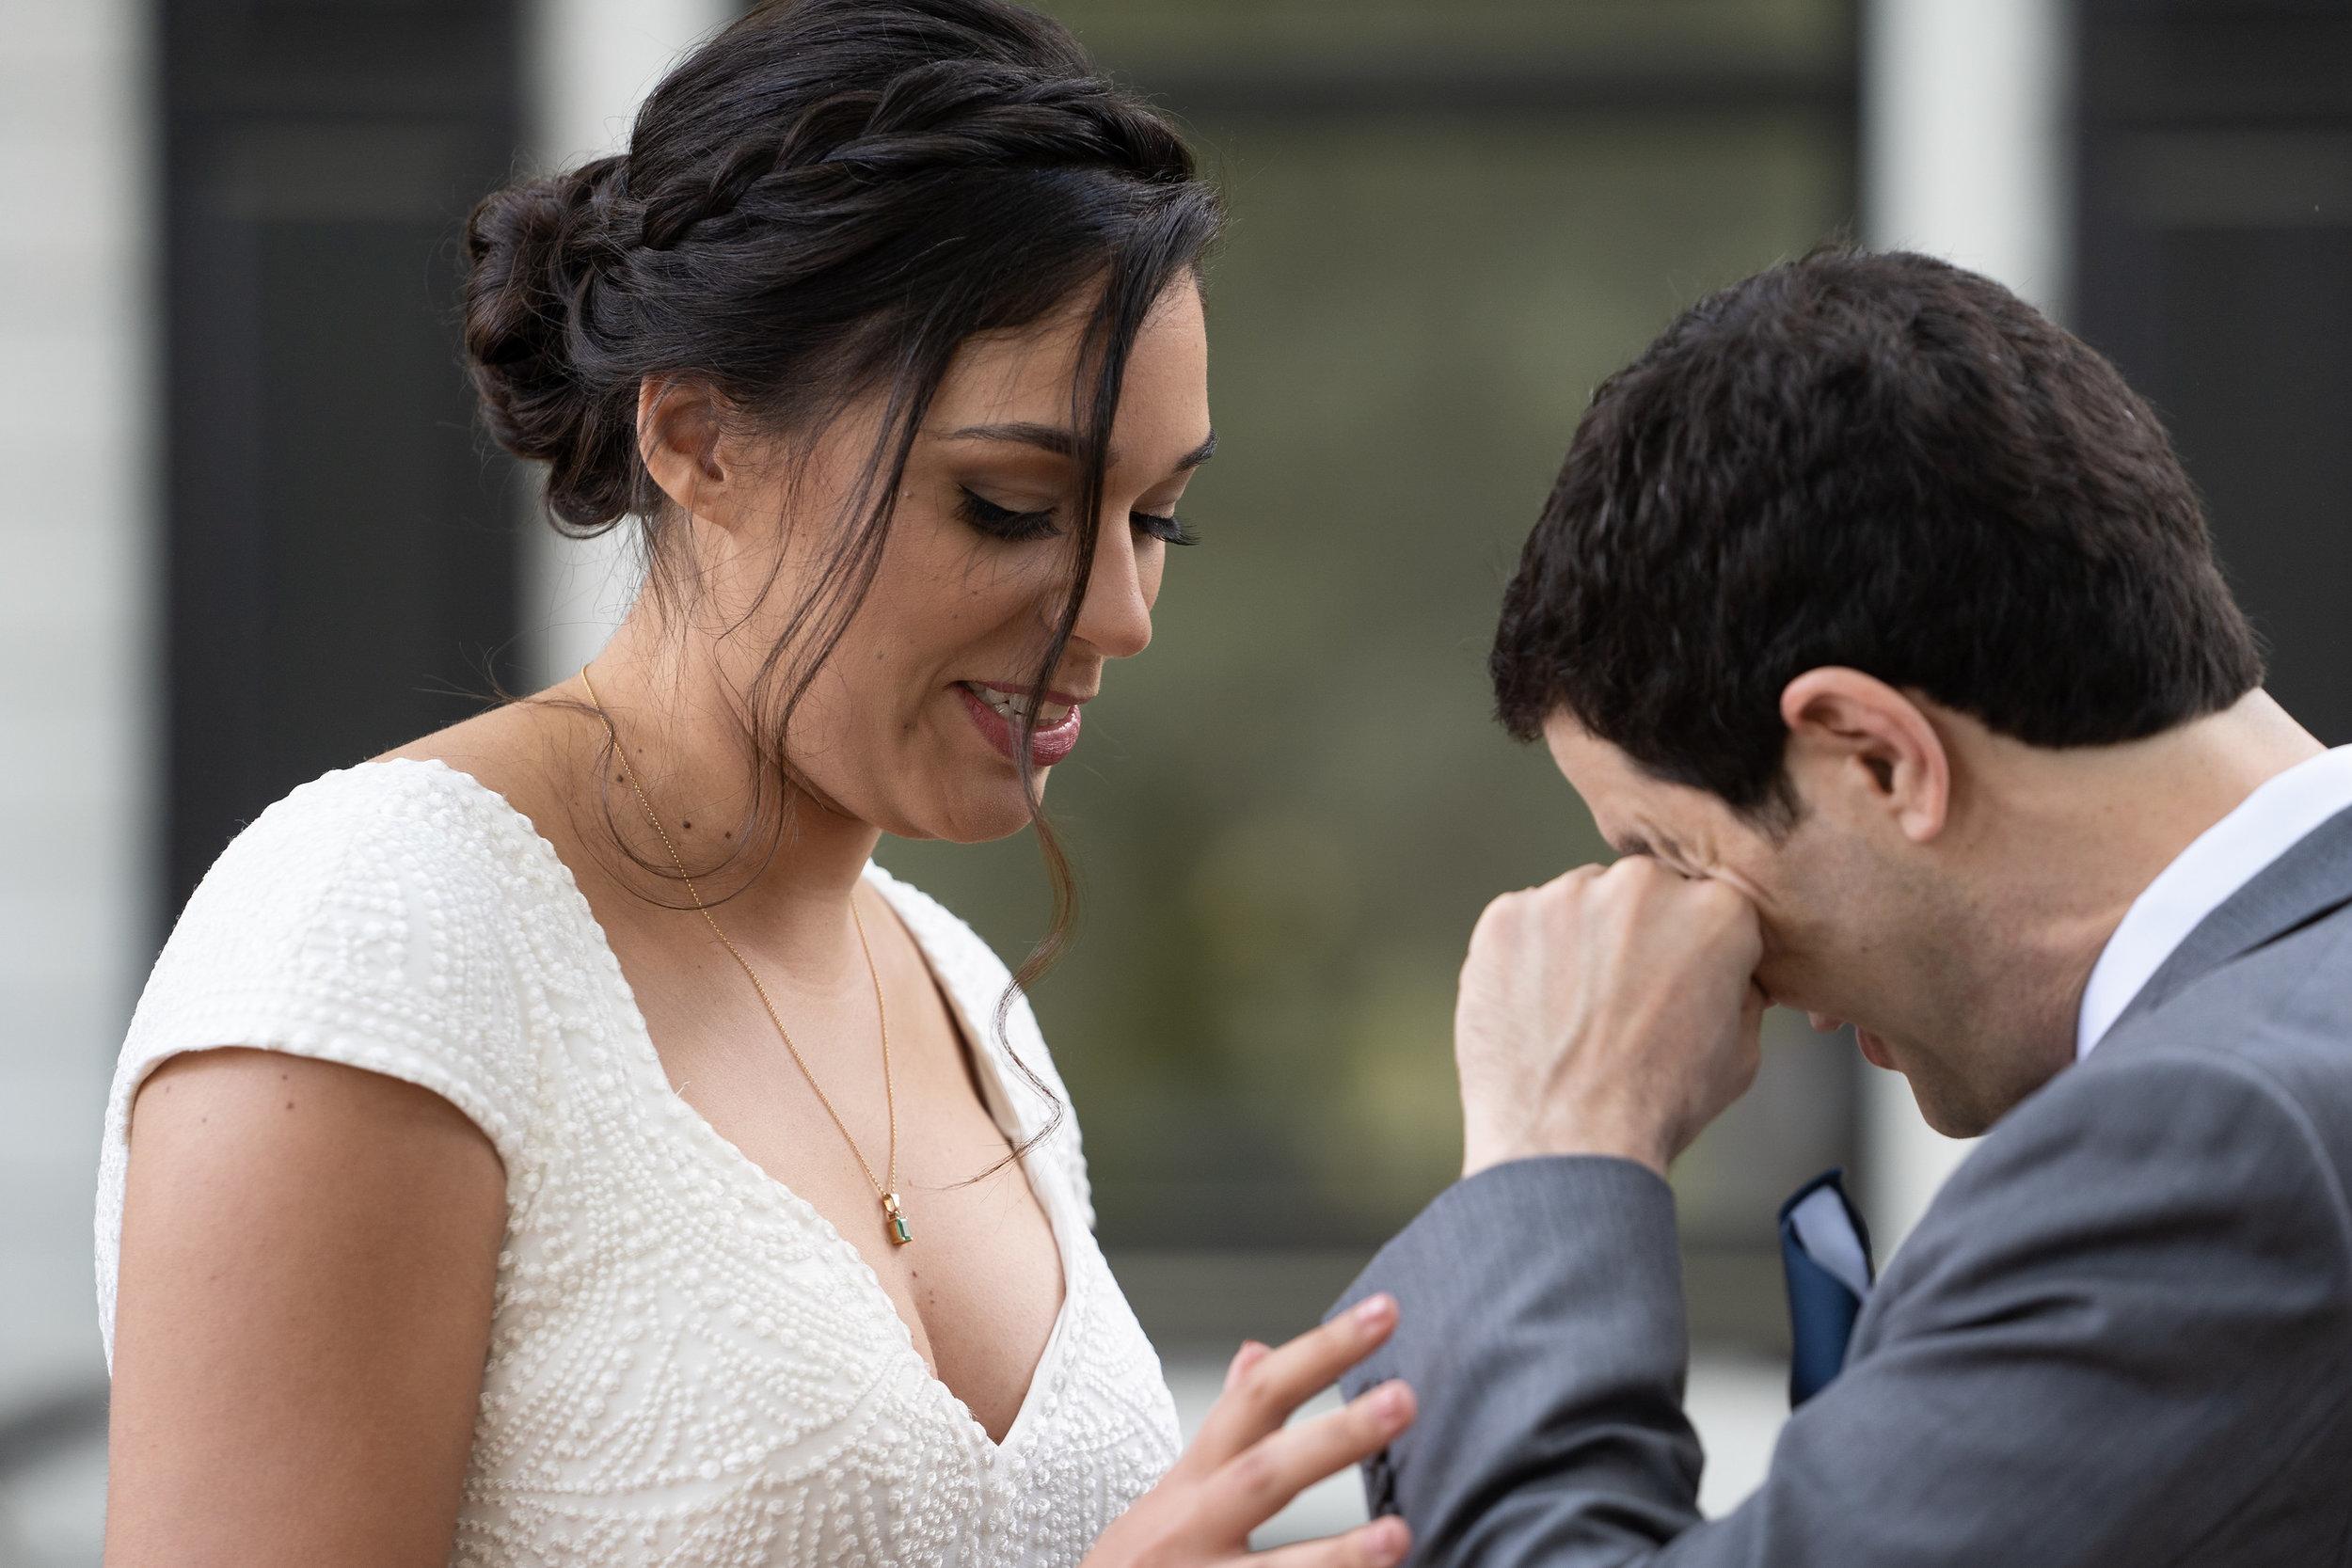 VisualRituals_raleigh-wedding-neal-sommer-03.jpg